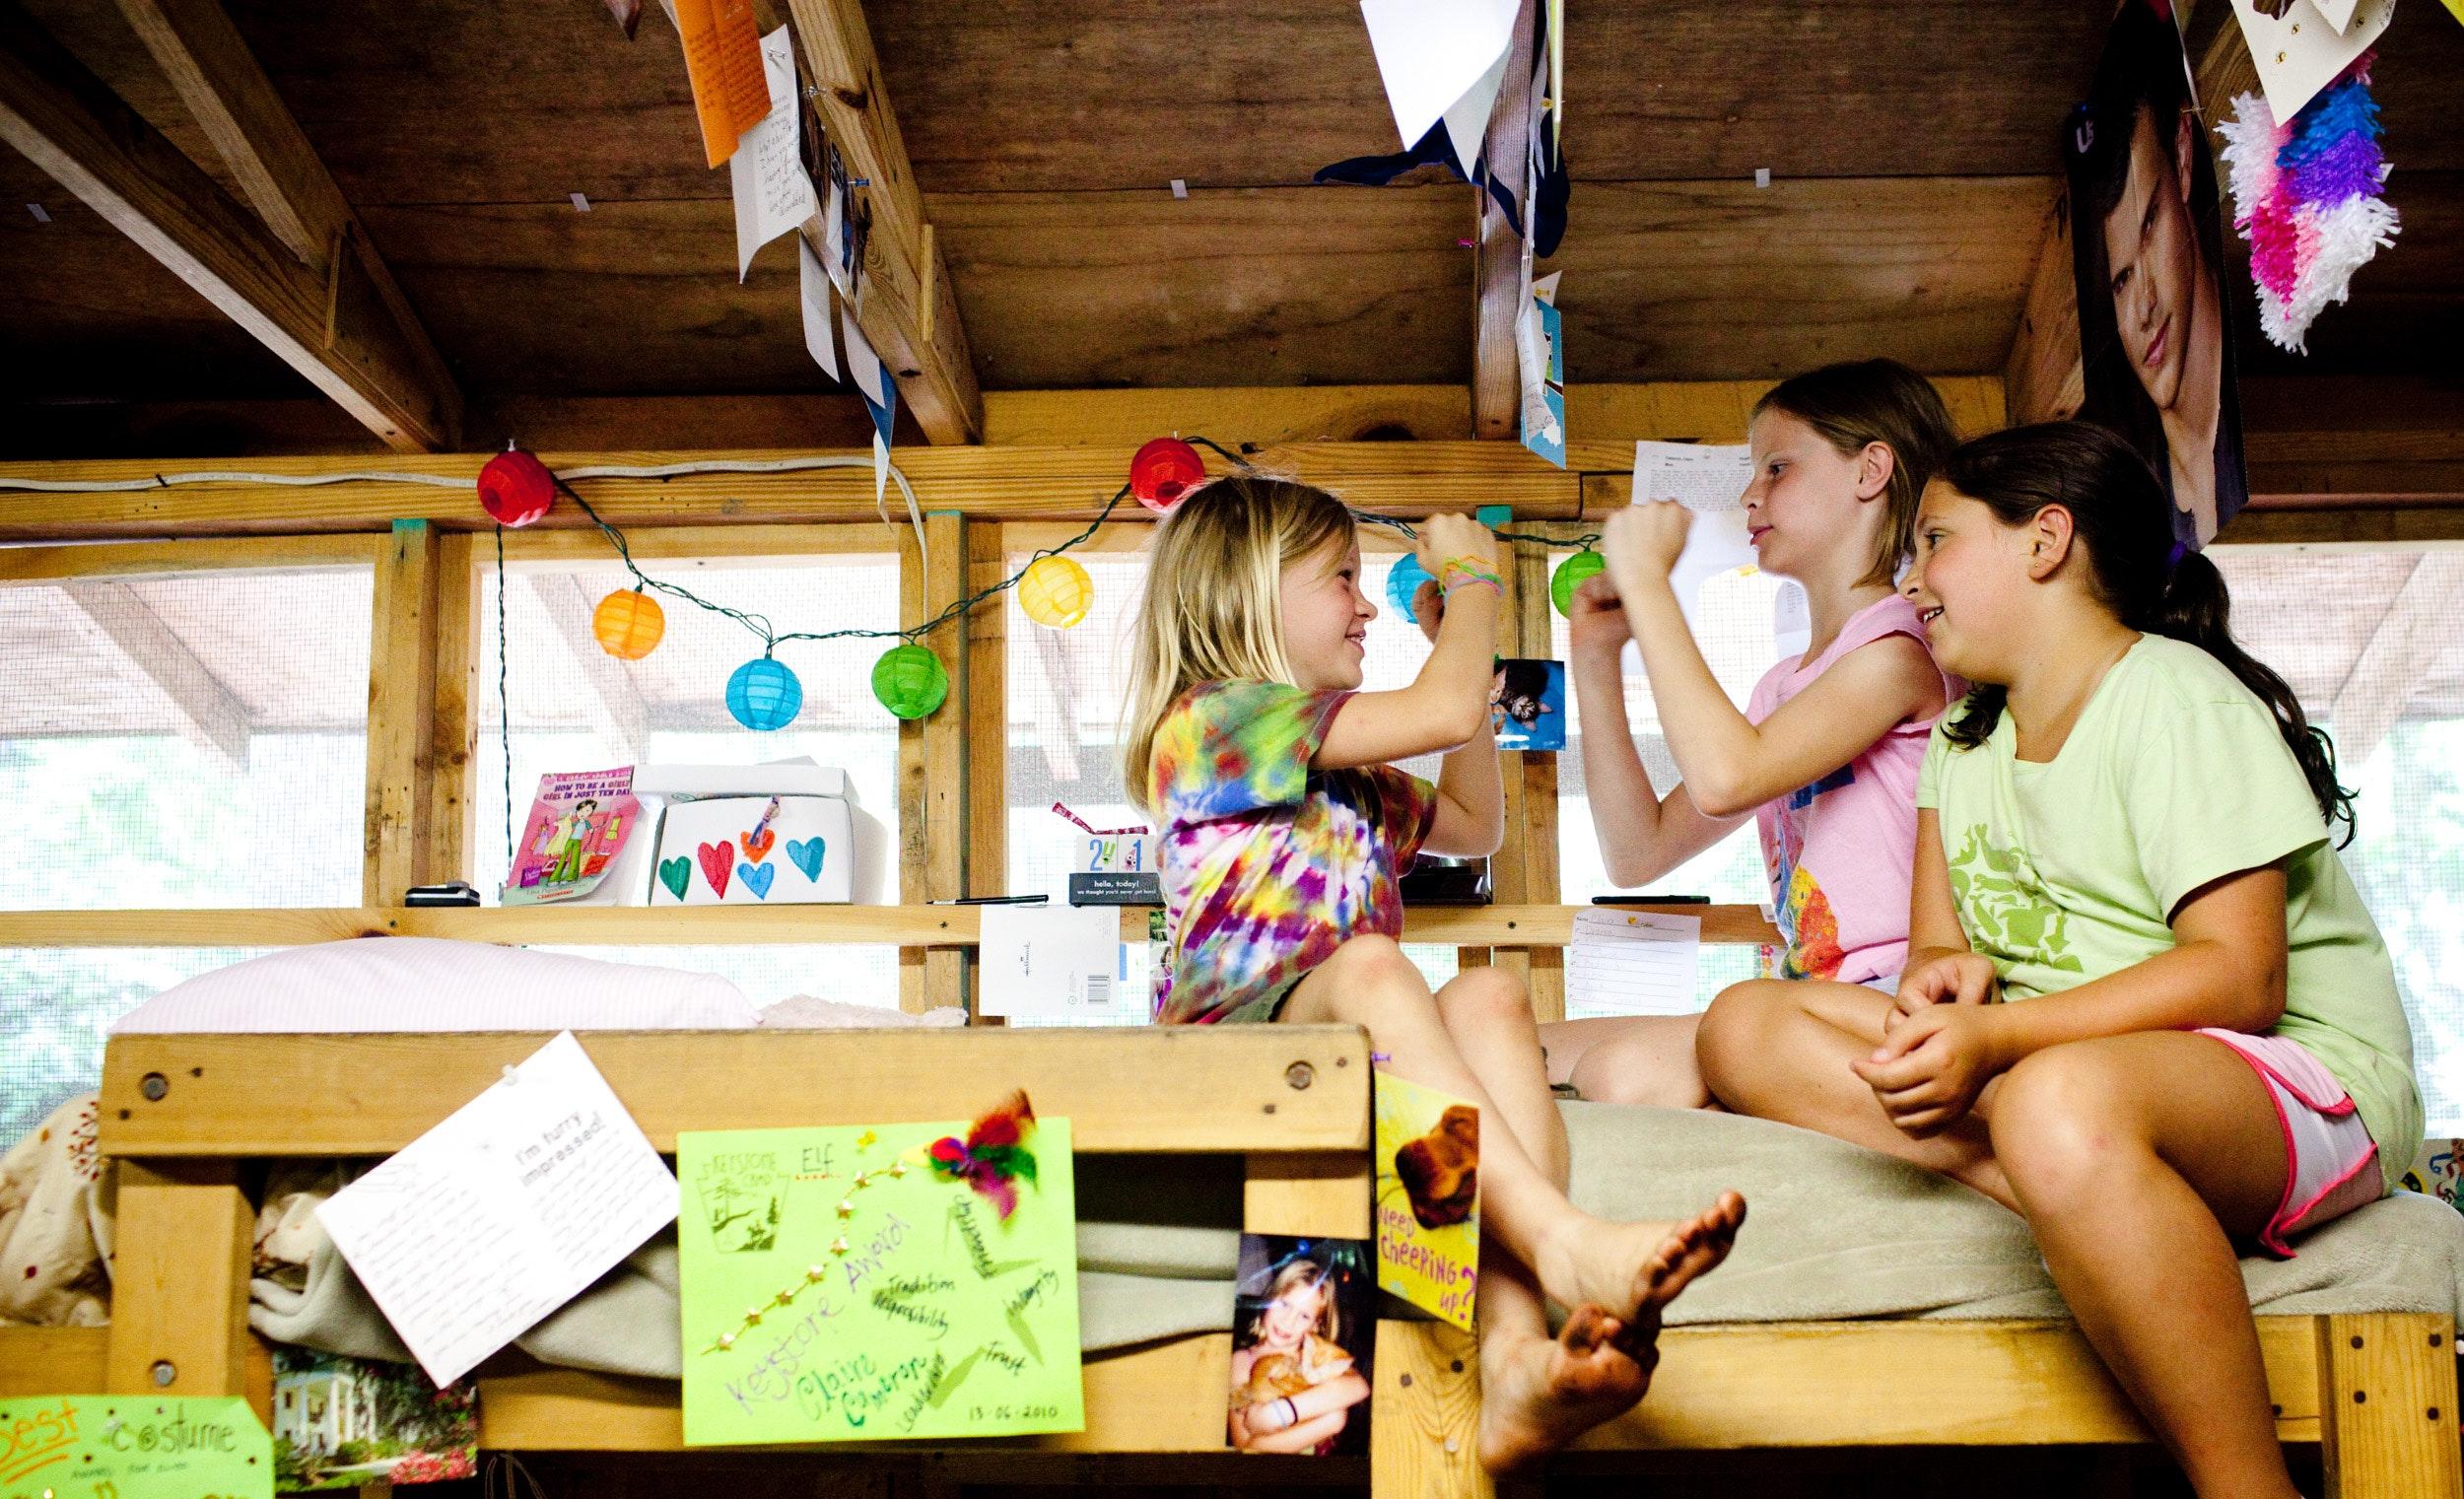 What to pack to keystone summer camp for girls in north carolina.jpg?ixlib=rails 2.1